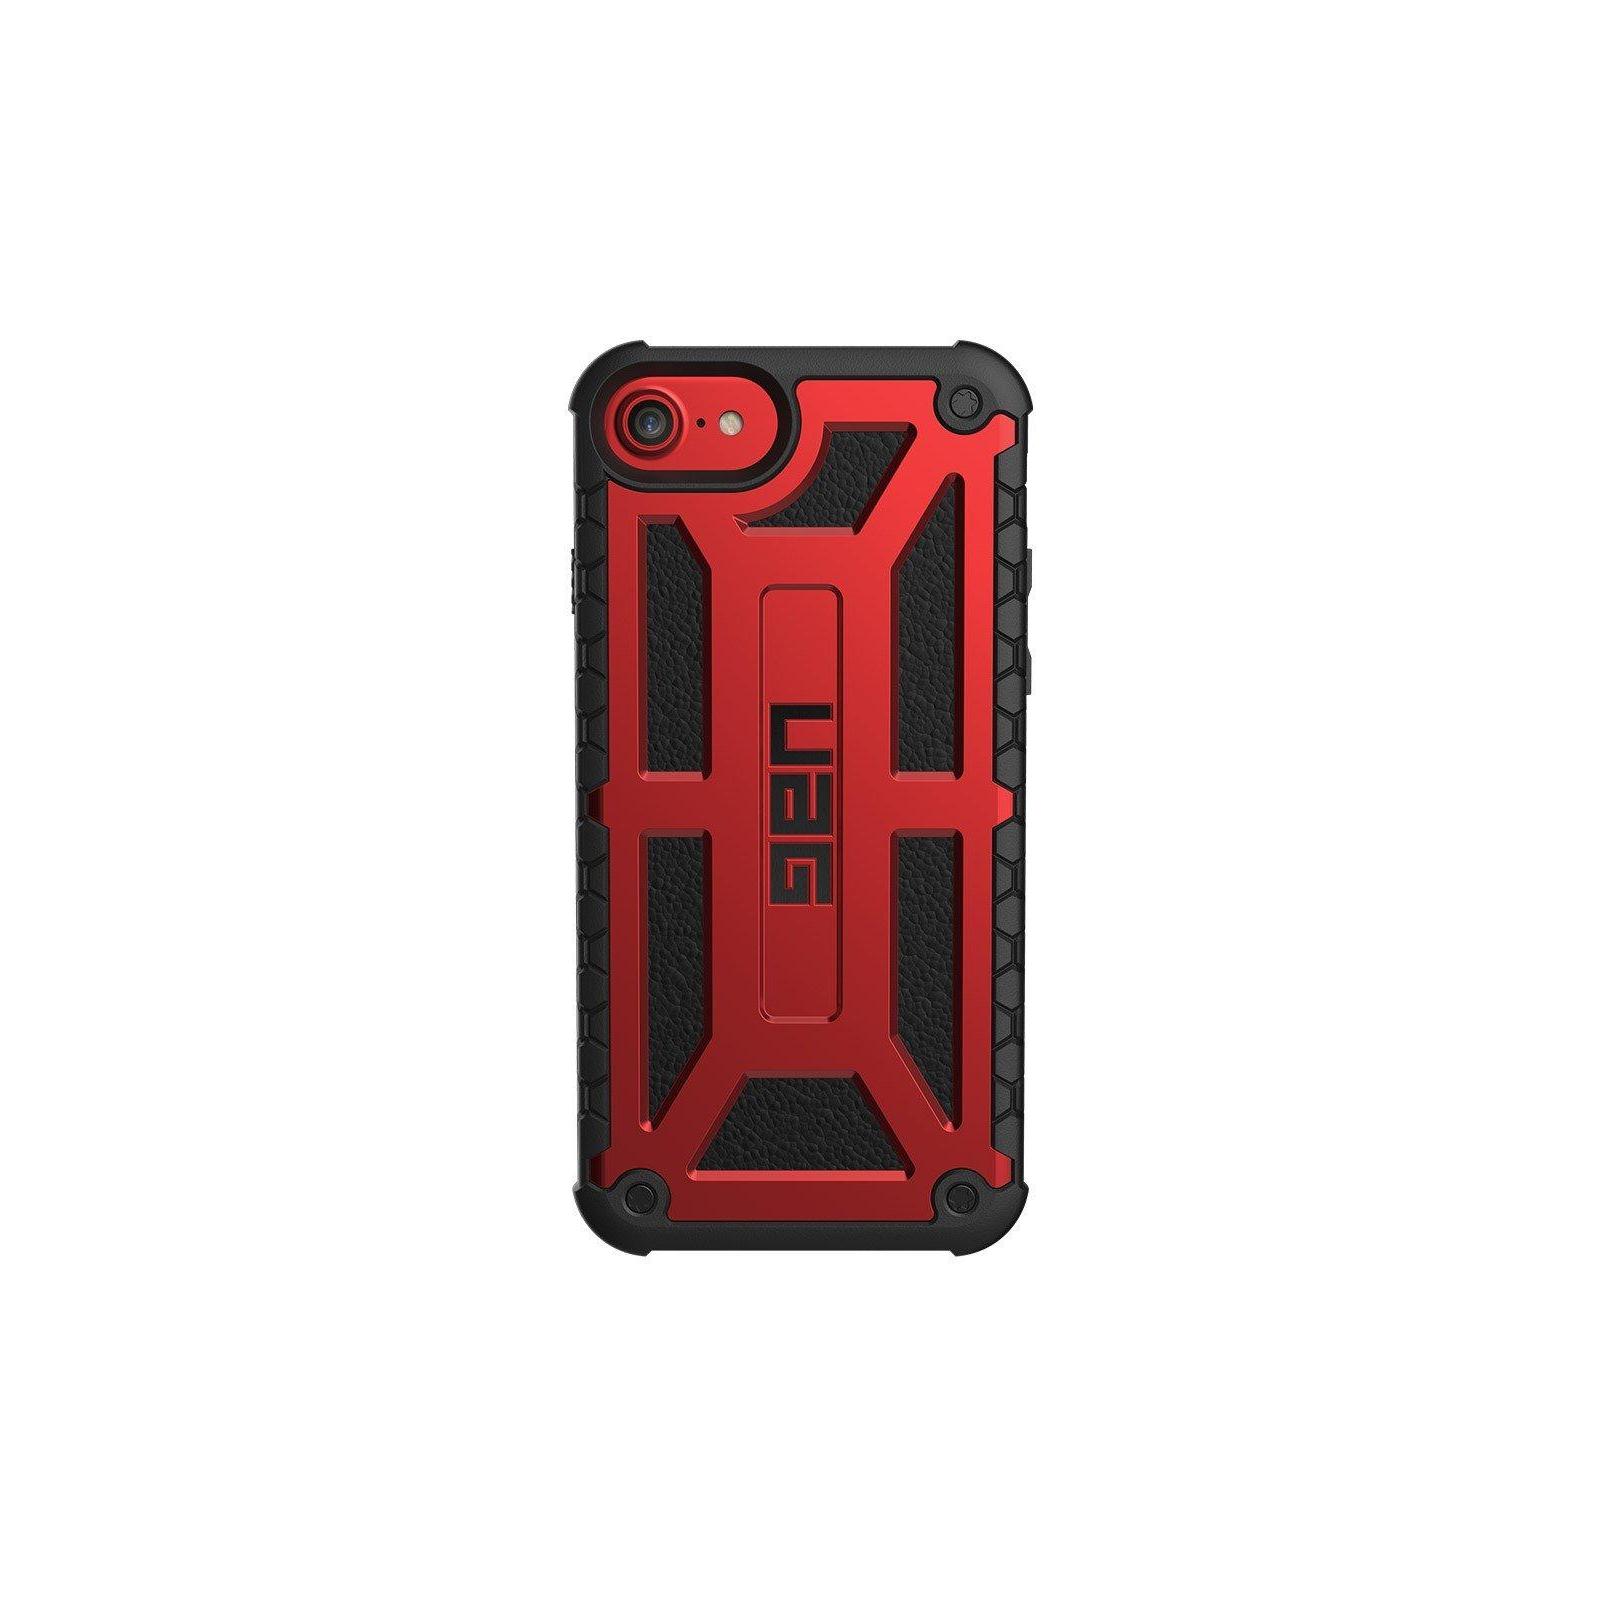 Чехол для моб. телефона UAG iPhone 8/7/6S/6 Monarch Crimson (IPH8/7-M-CR)